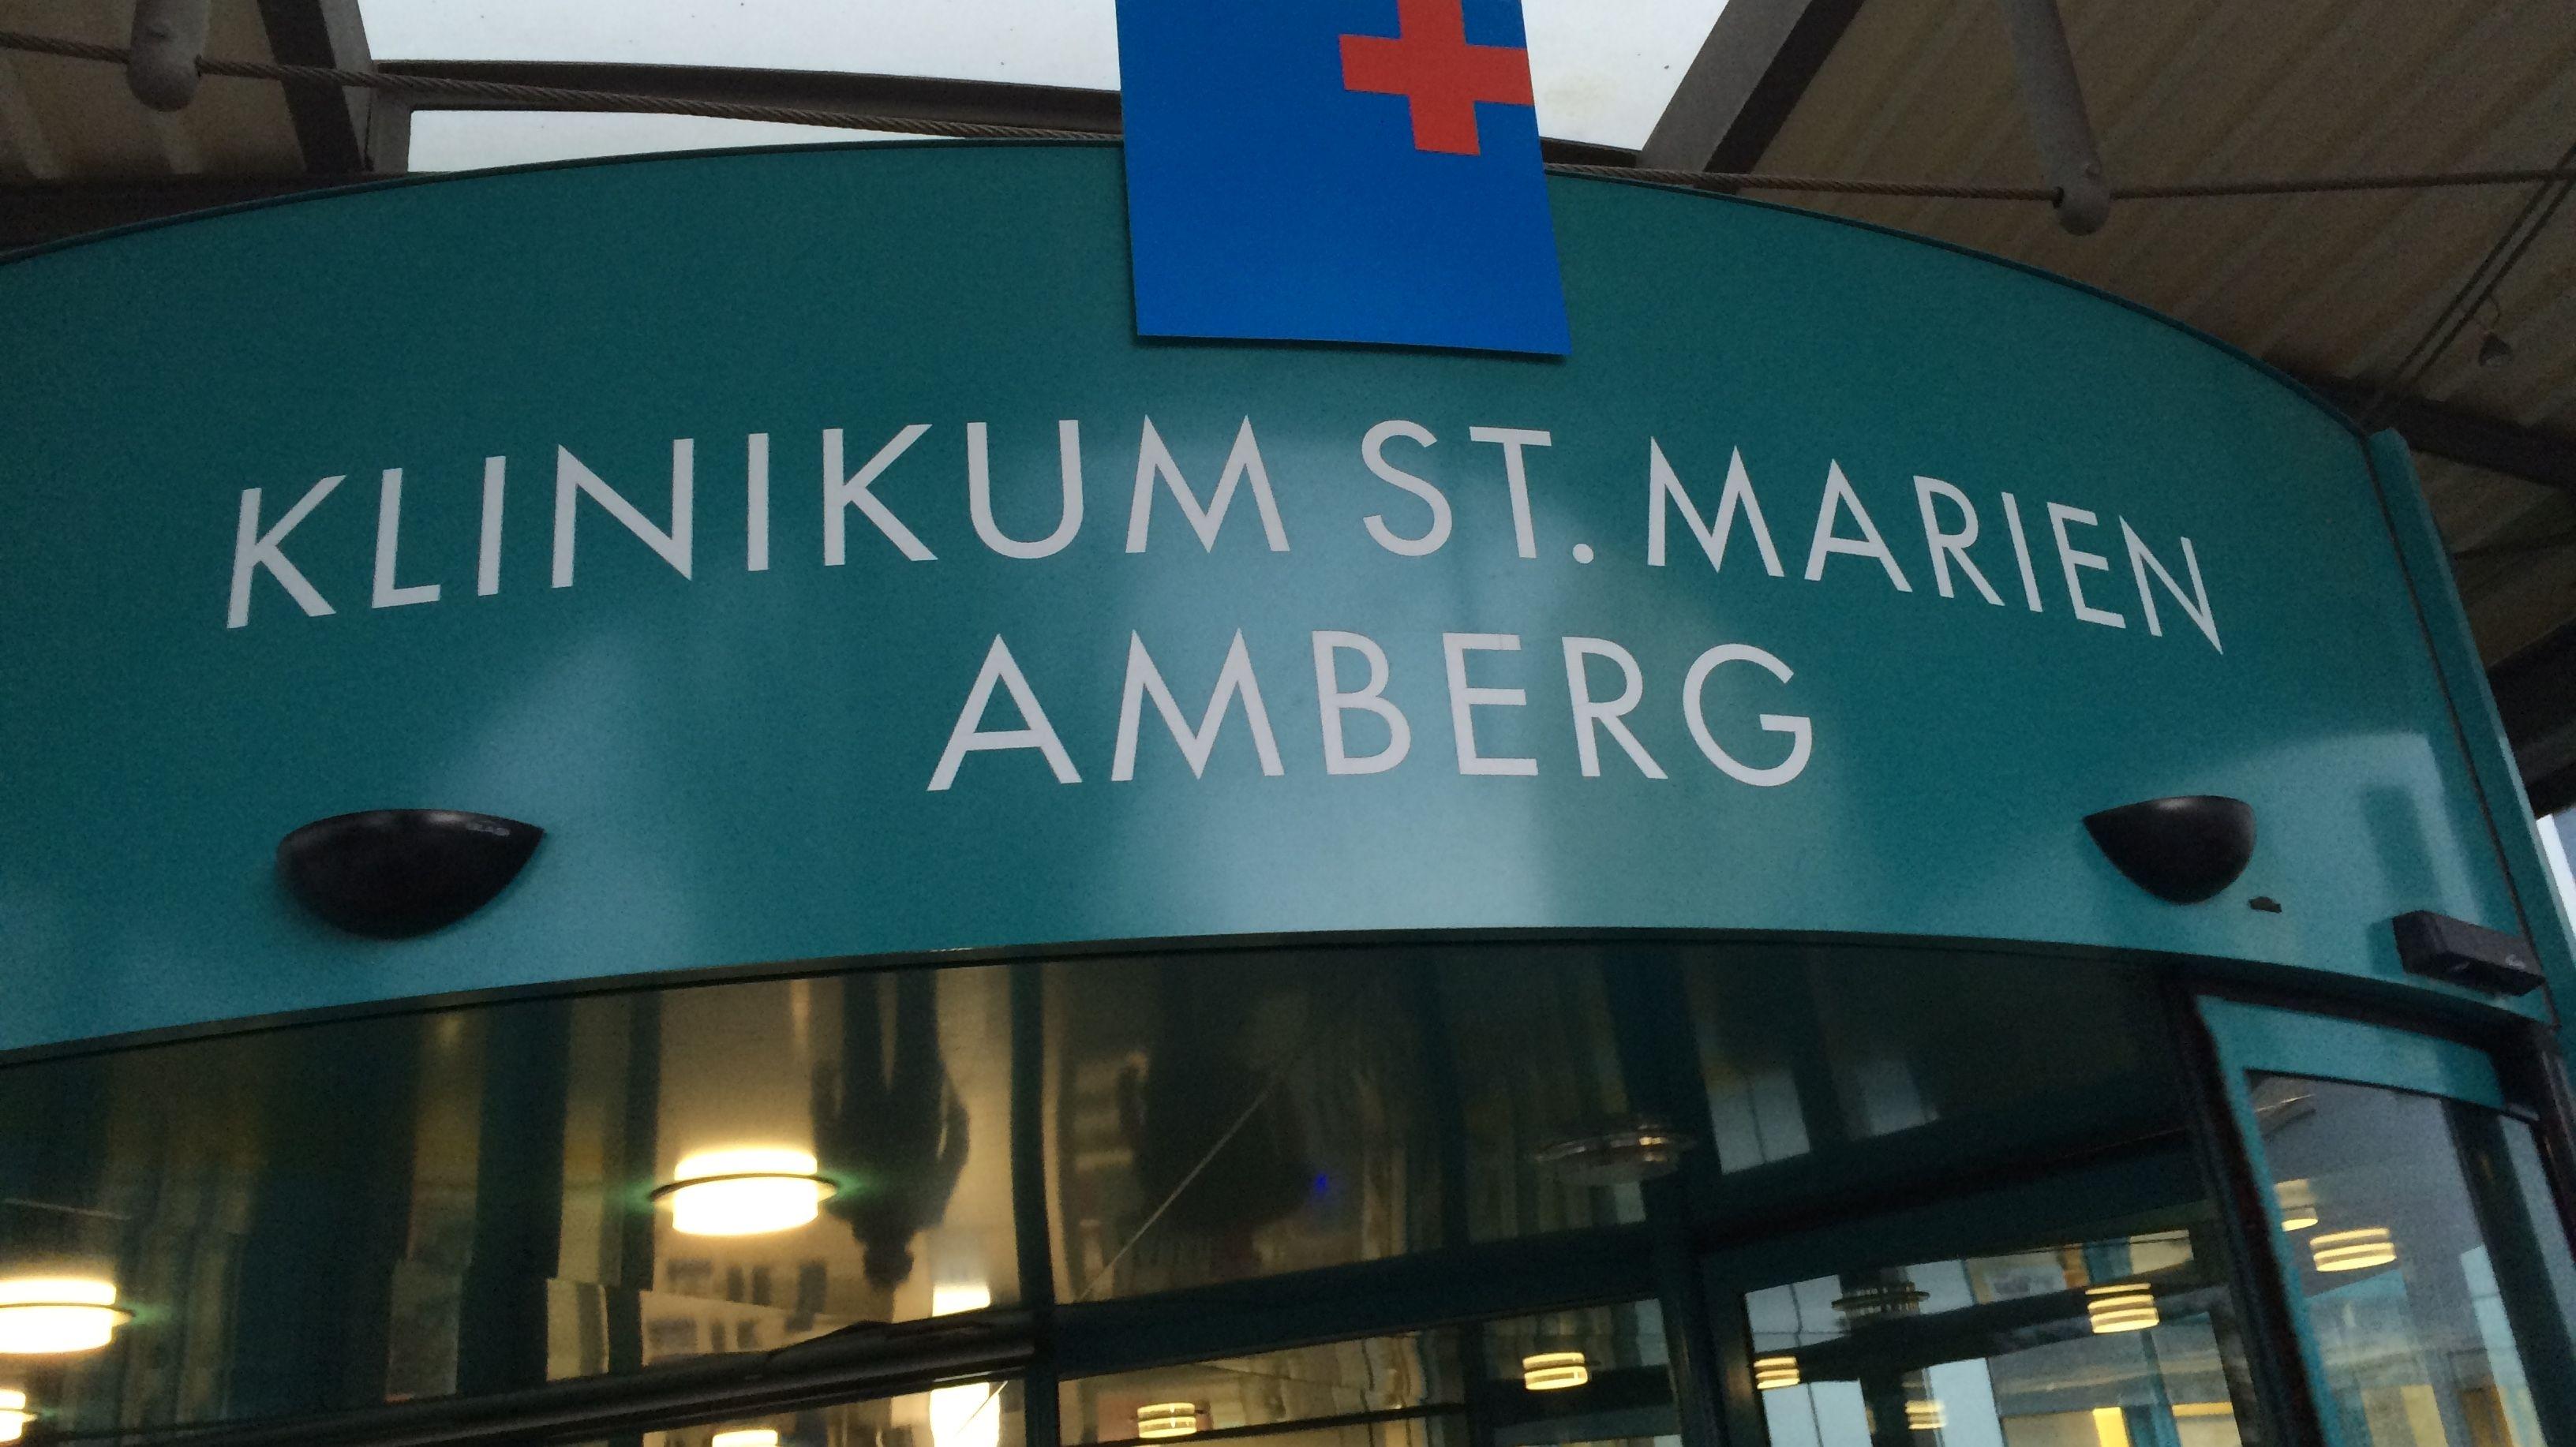 Eingang zum St. Marien-Klinikum in Amberg